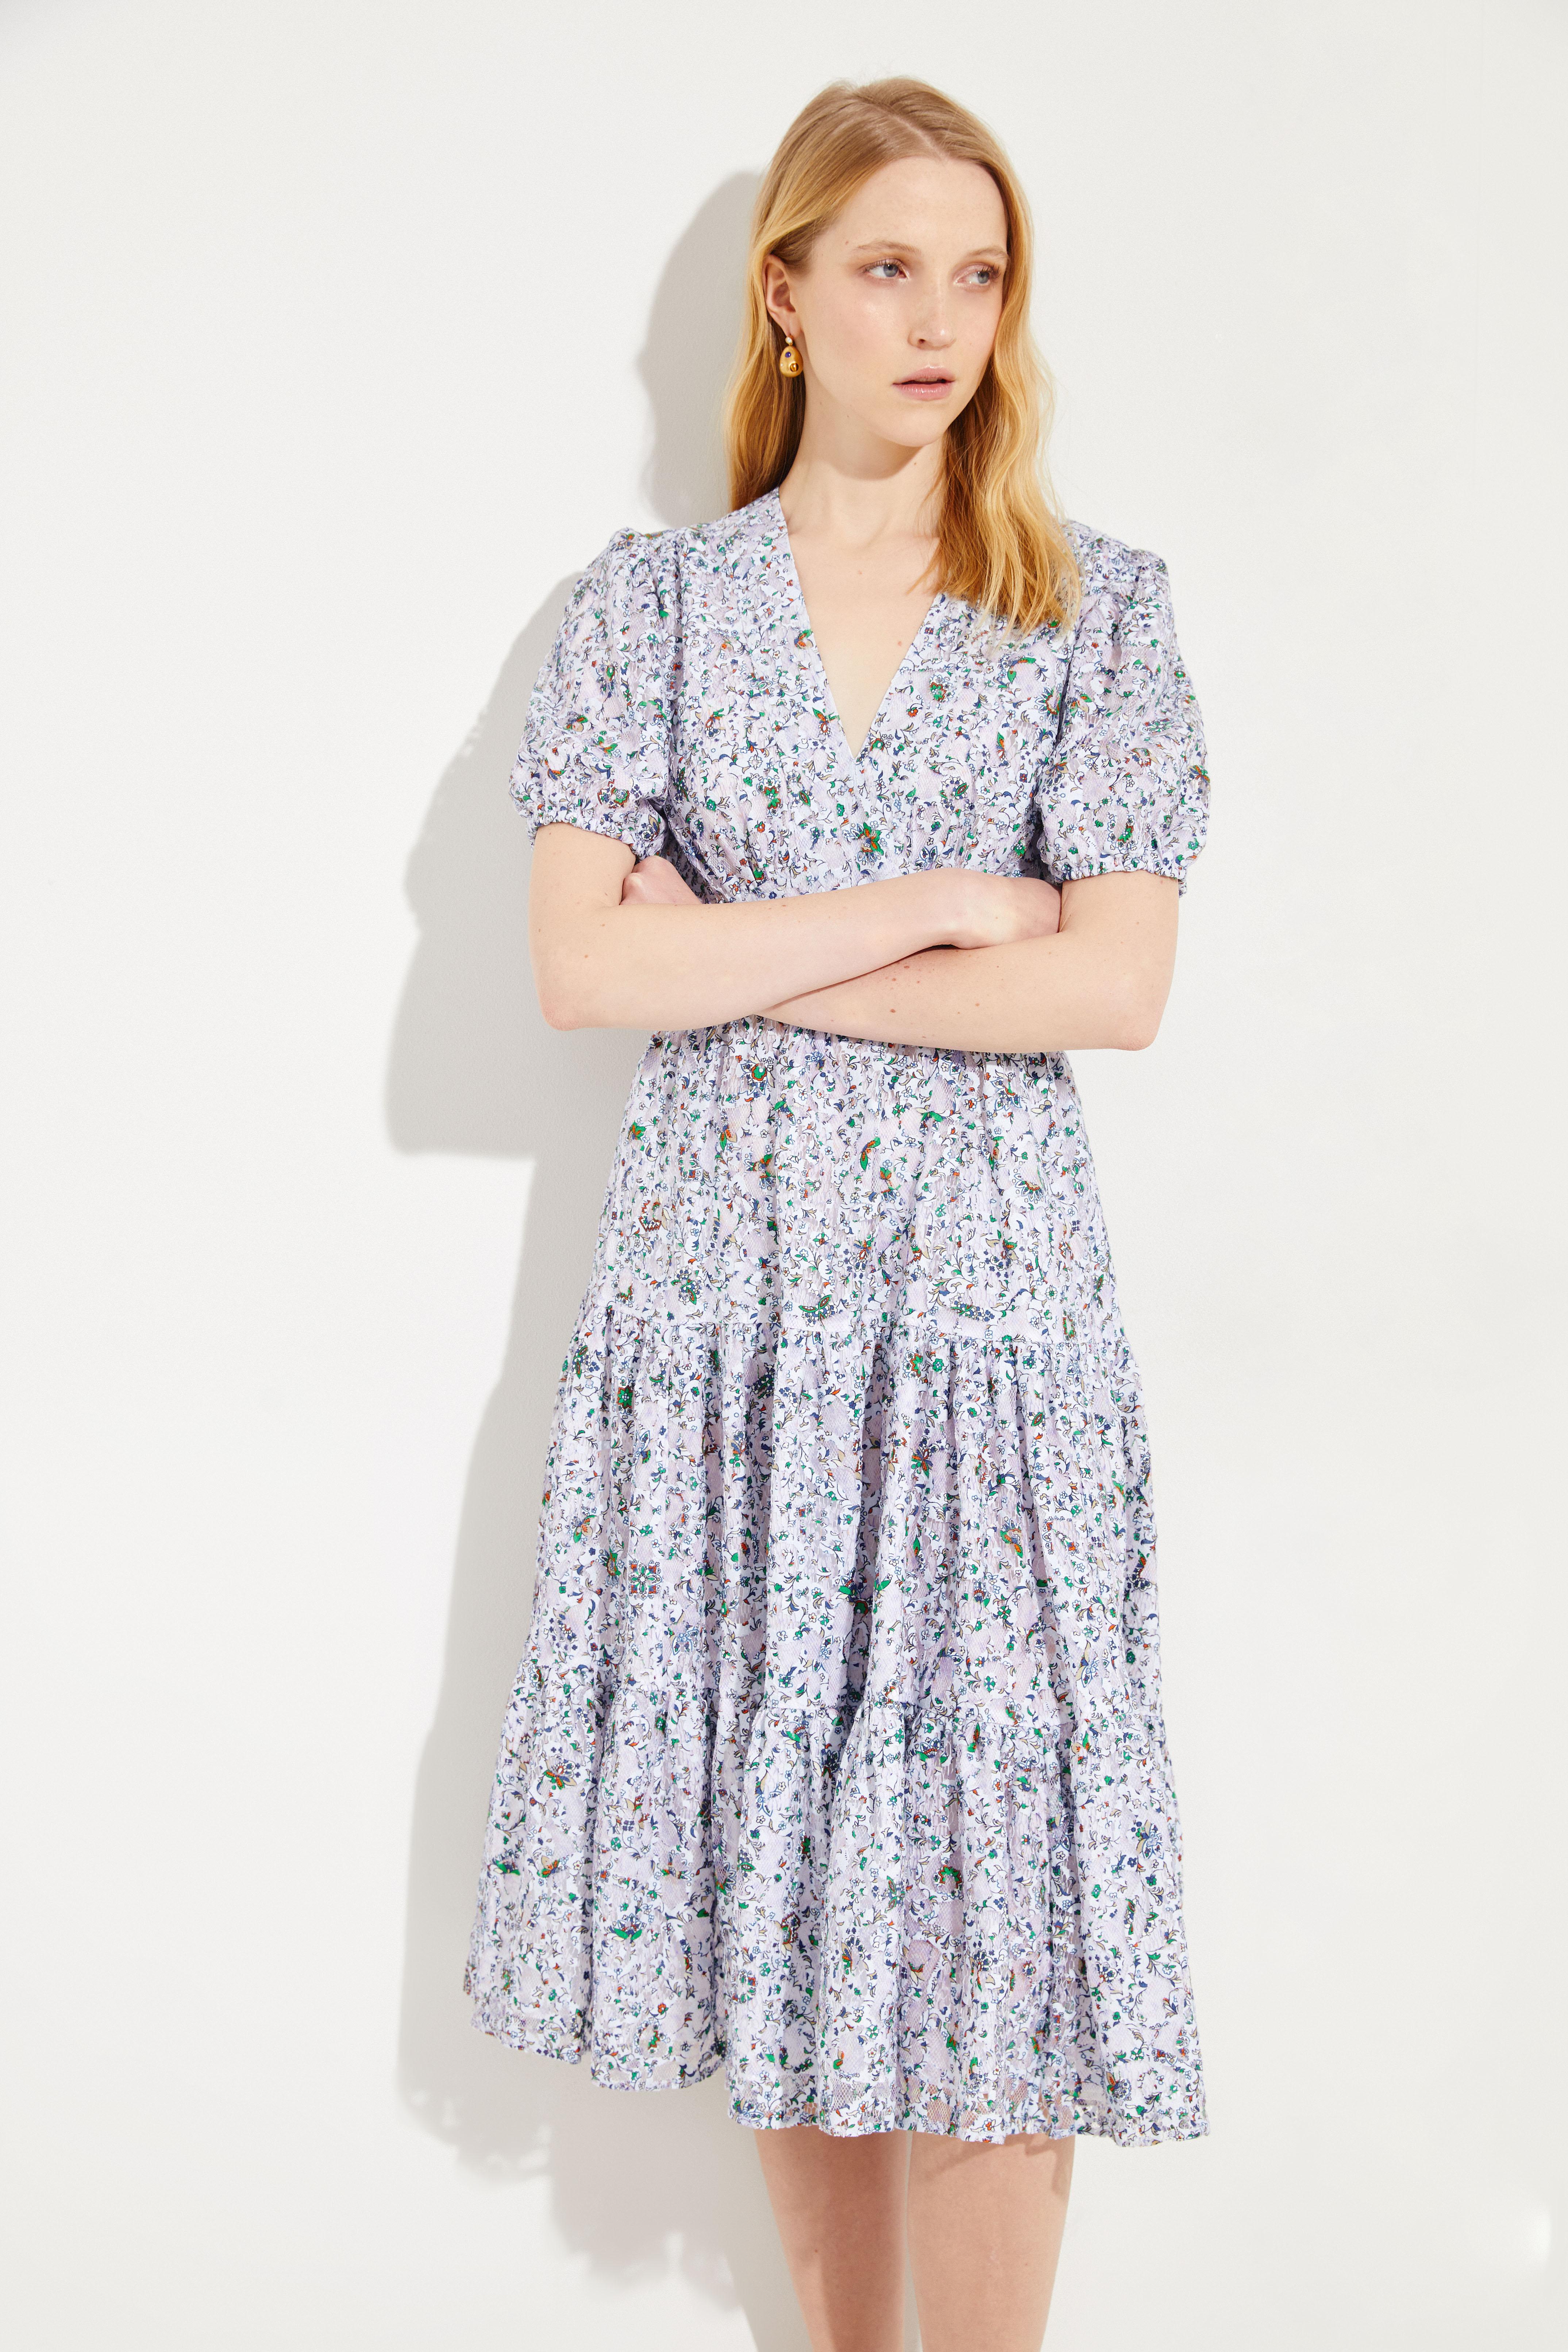 a9f151750a6 Cotton lace dress Blue Multi